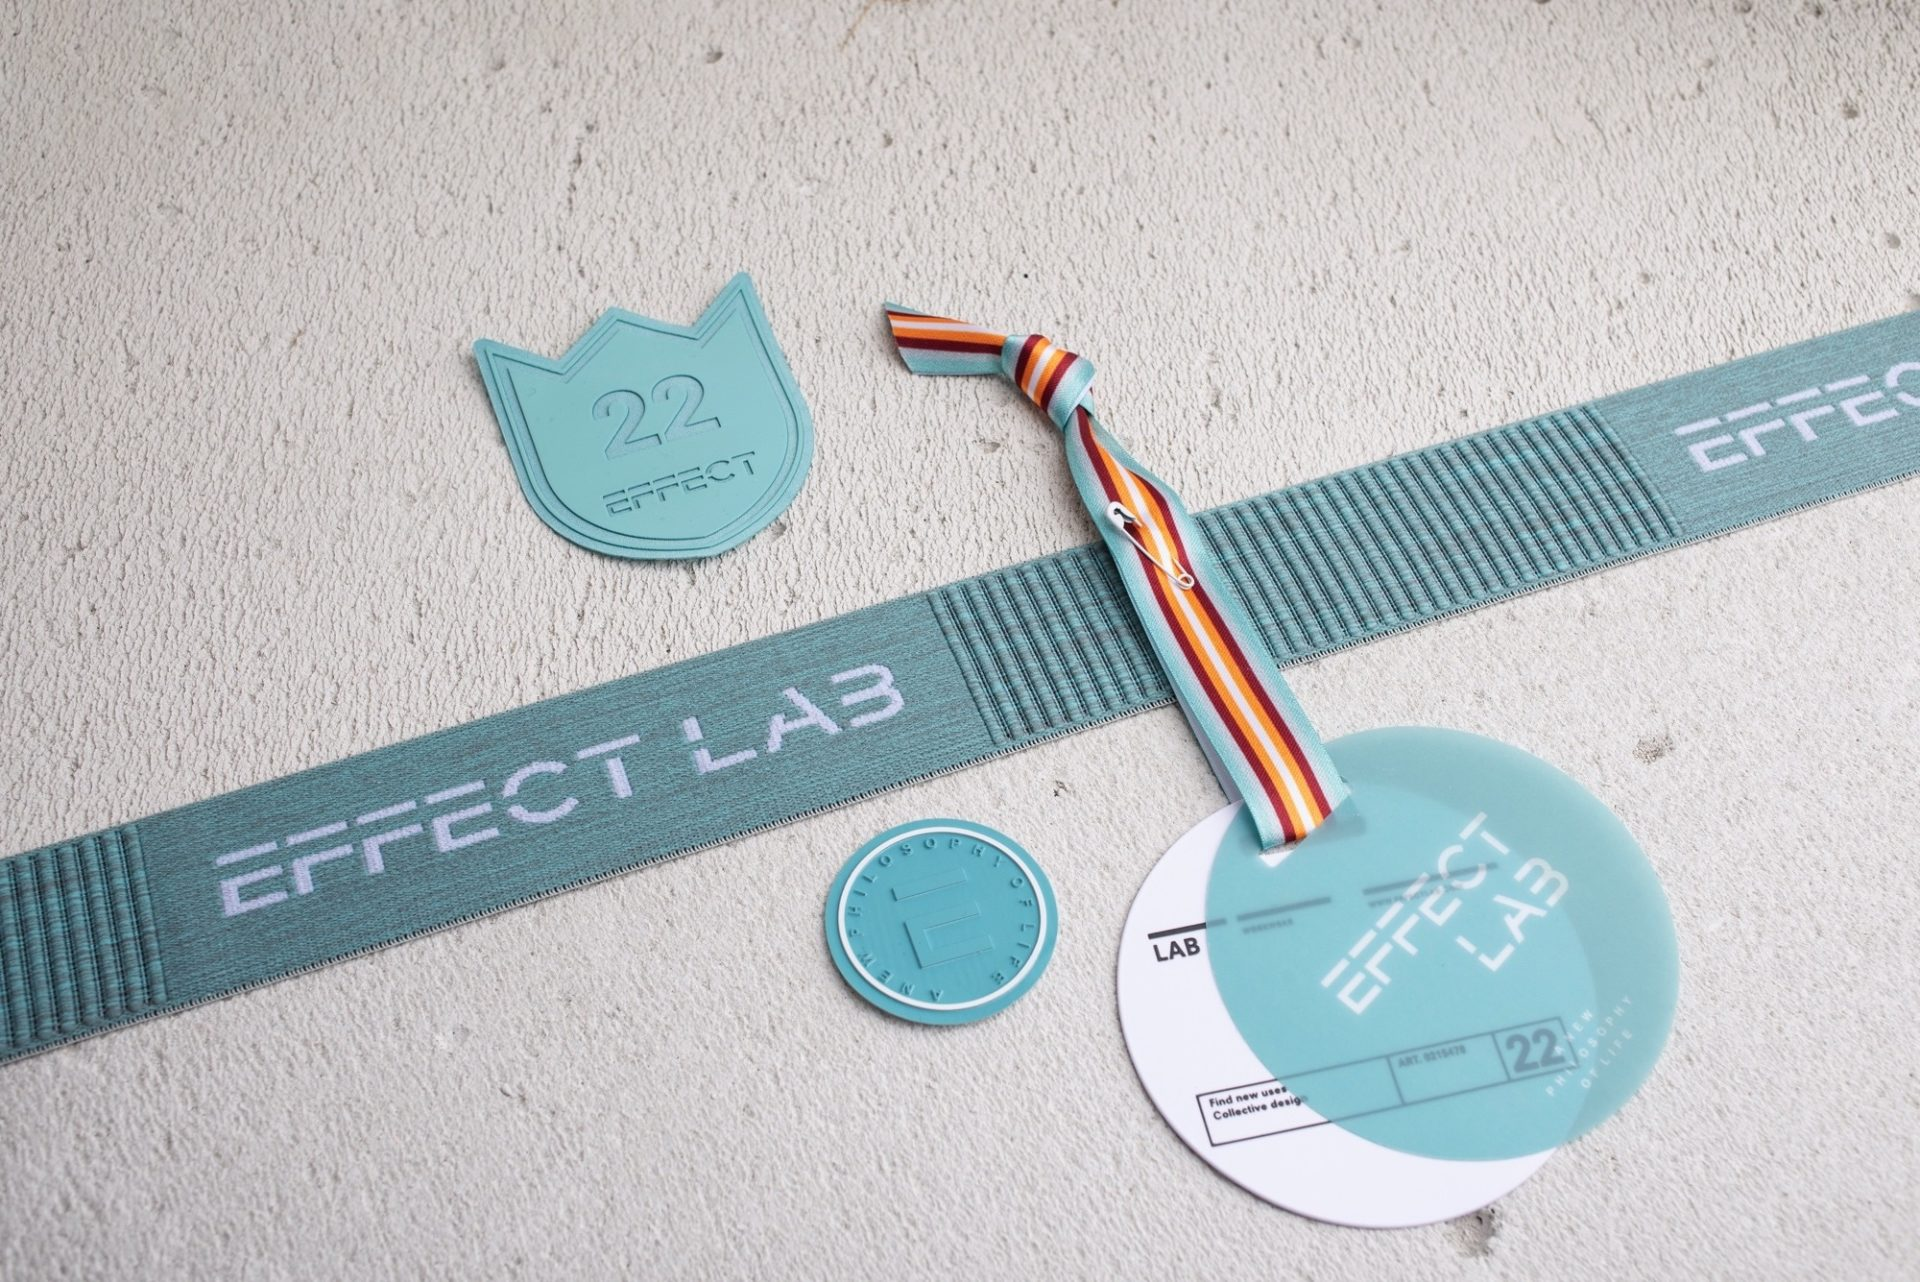 14_EFFECT_LAB